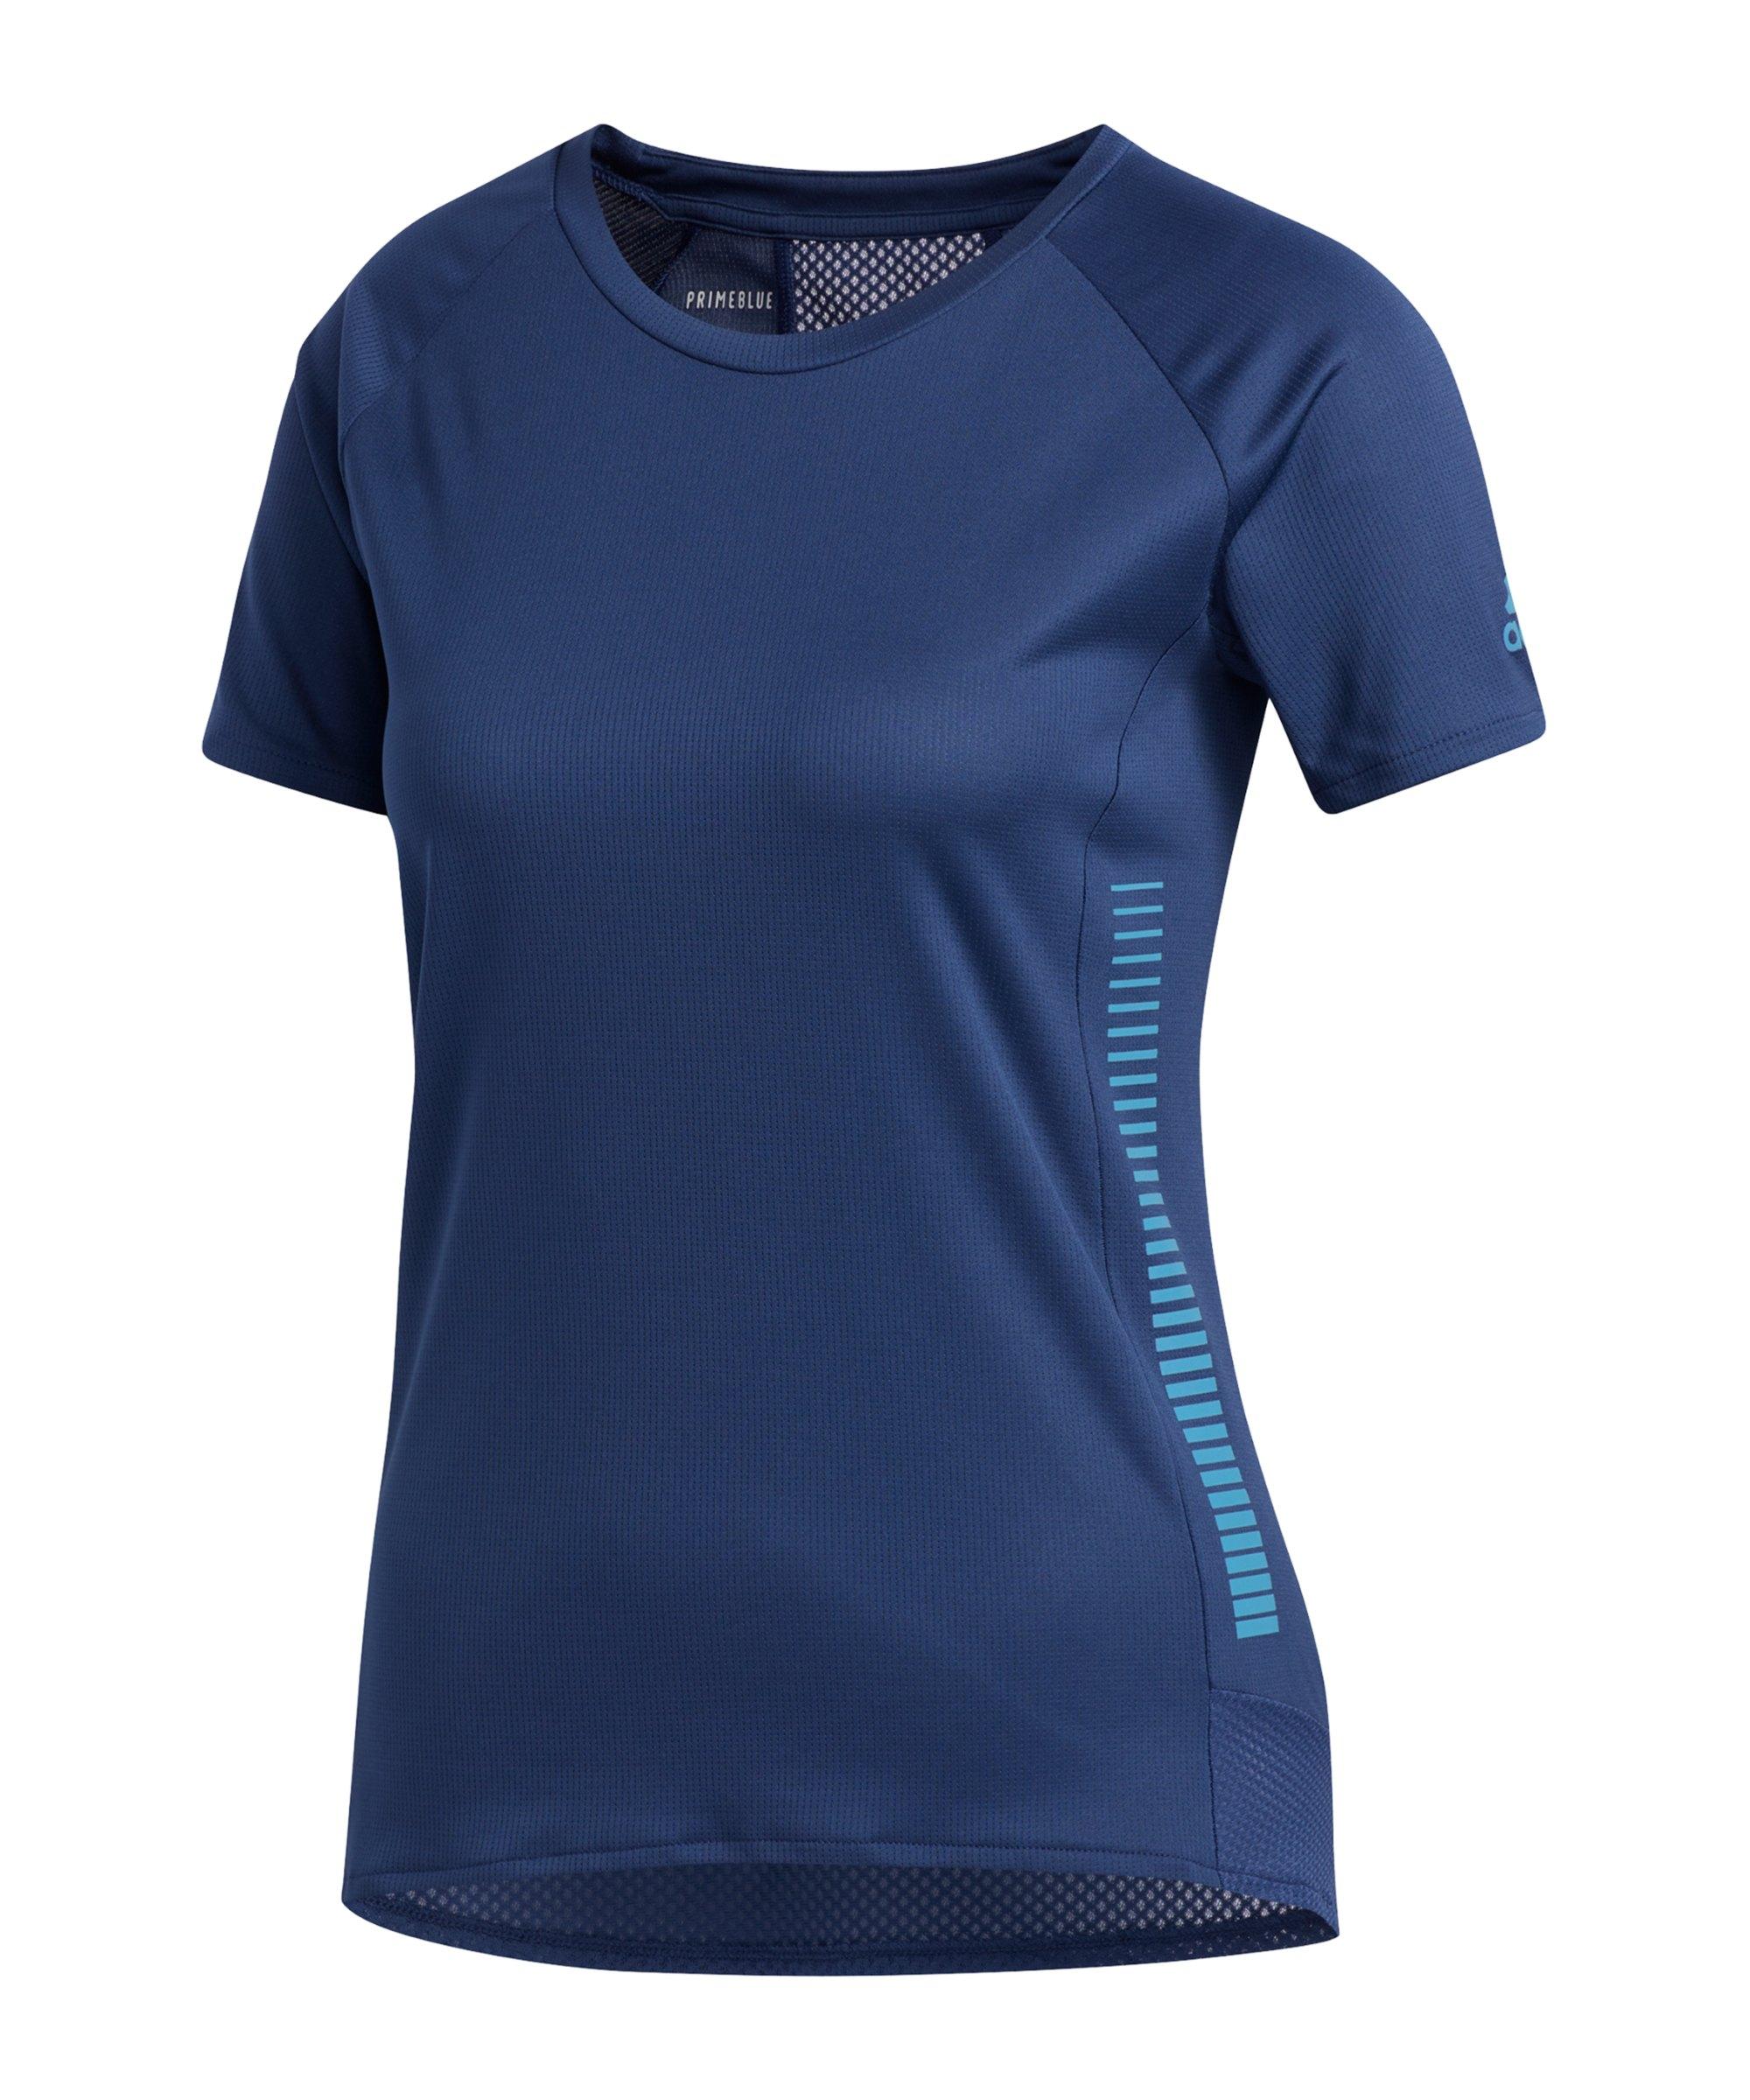 adidas 25/7 T-Shirt Running Damen Blau - blau